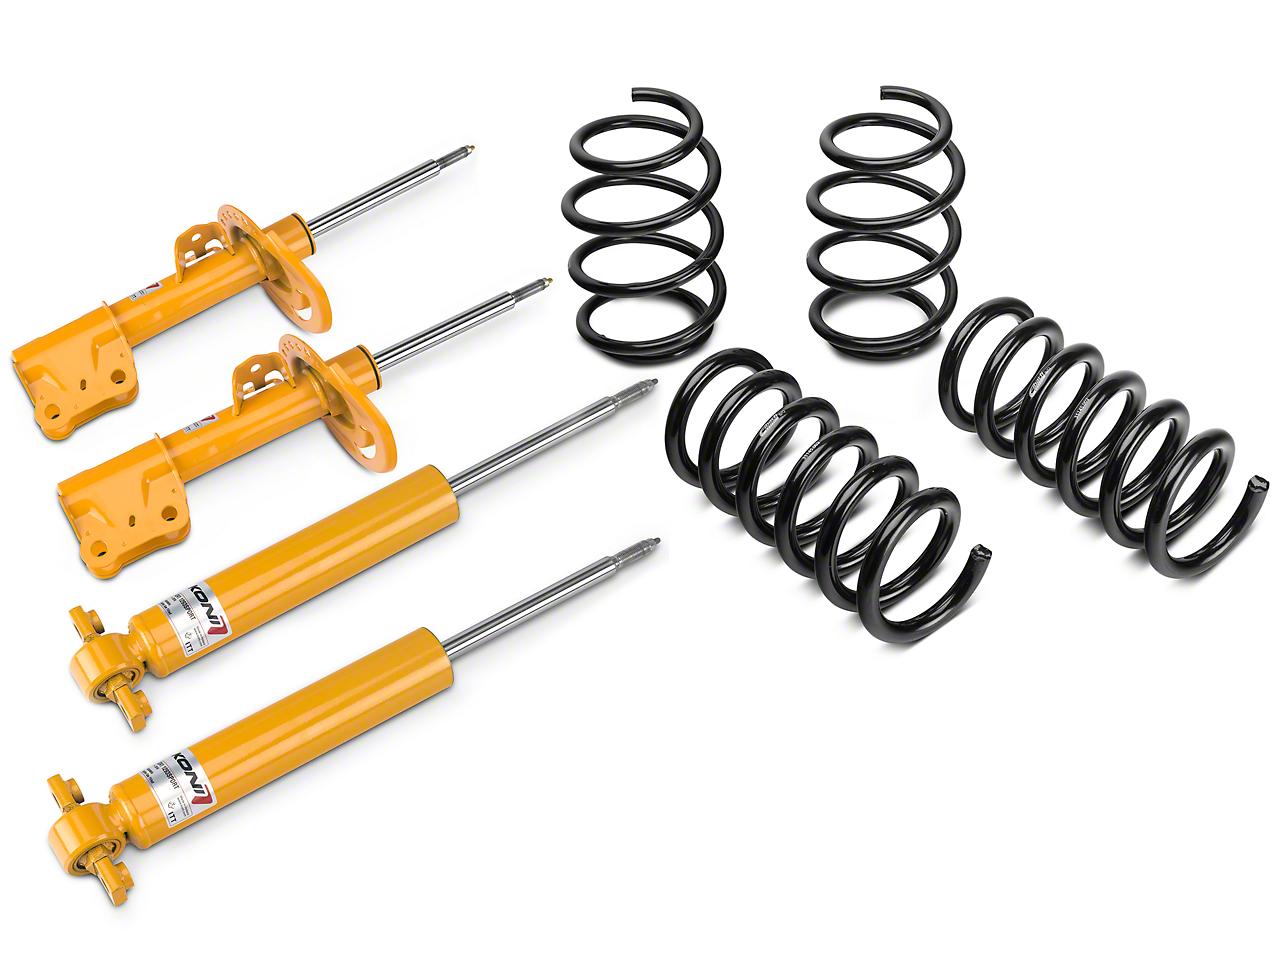 KONI Sport Adjustable Shock, Strut & Eibach Pro-Kit Lowering Springs (15-17 V6, EcoBoost)